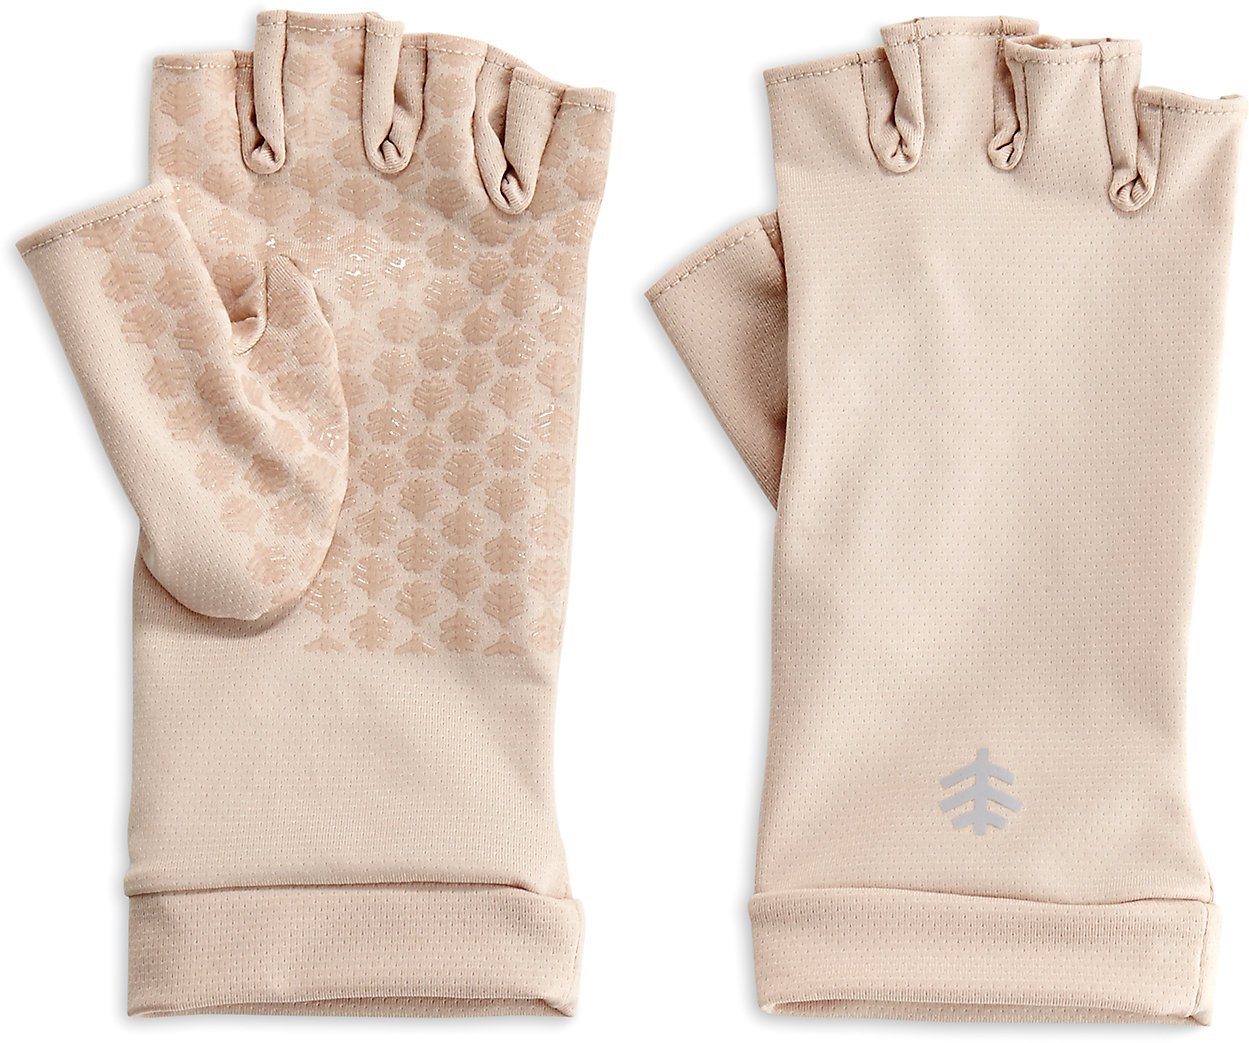 Coolibar UPF 50+ Unisex Fingerless Sun Gloves - Sun Protective (Small- Beige)